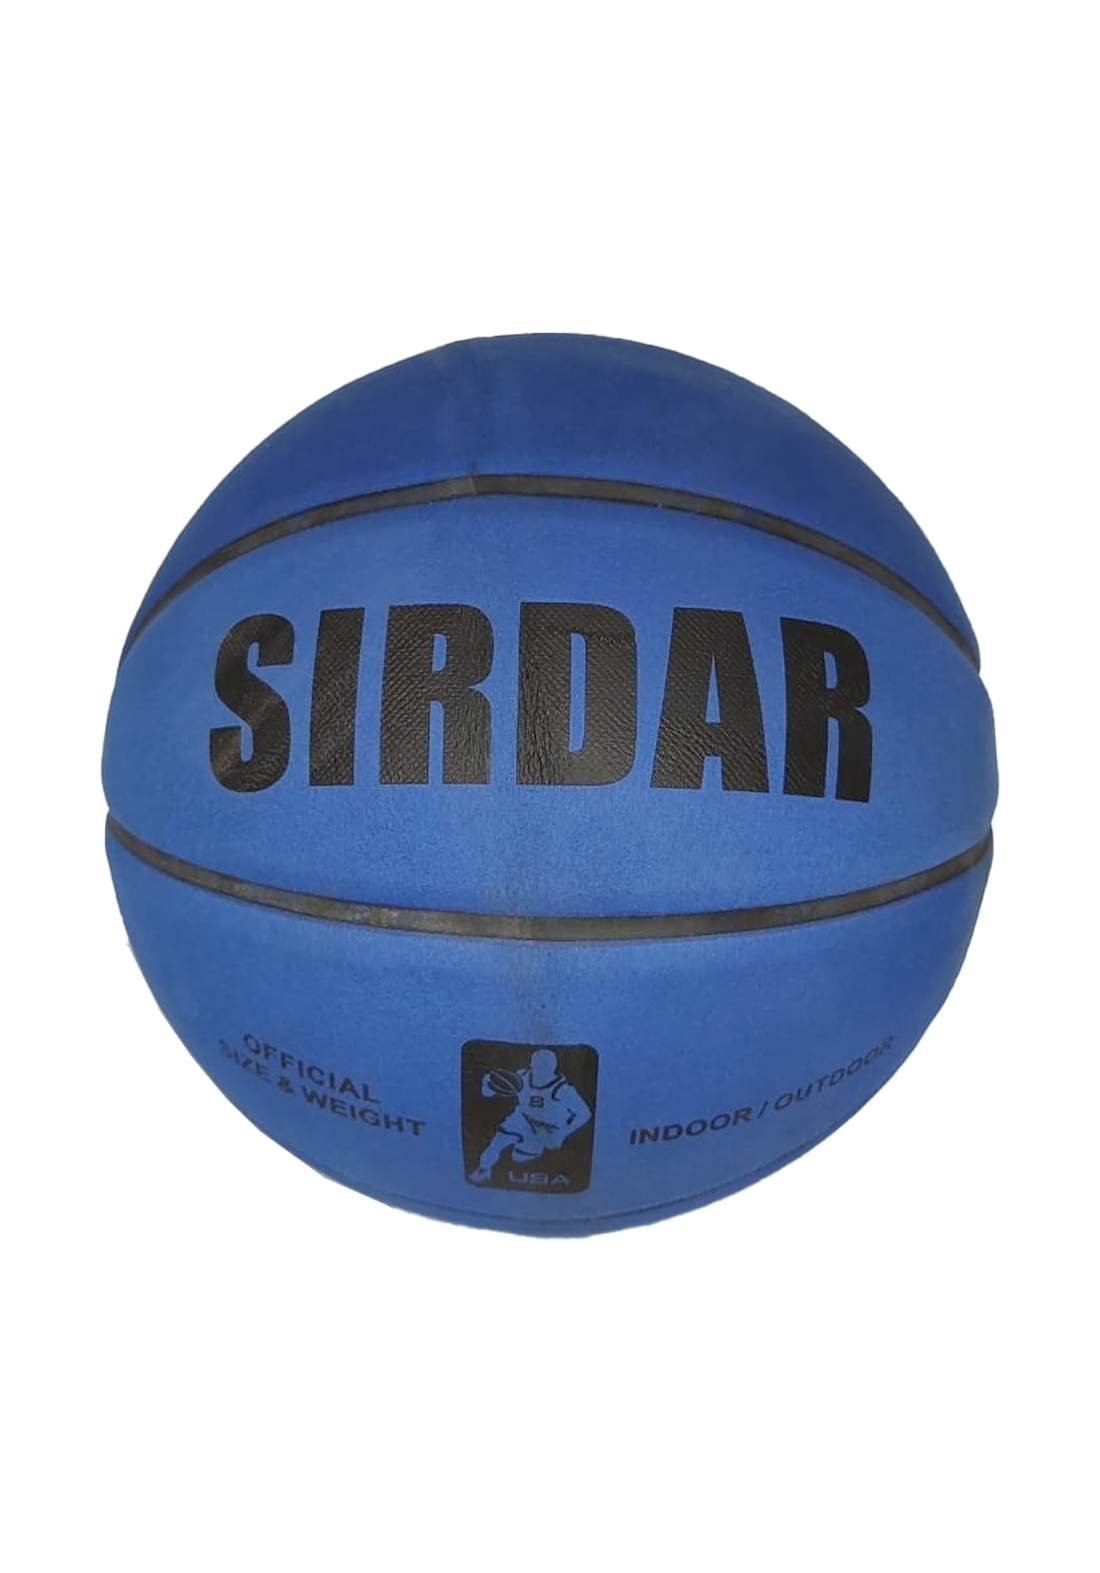 Sirdar Basketball Leather Basketball Balls Outdoor Indoor Size 7 كرة سلة